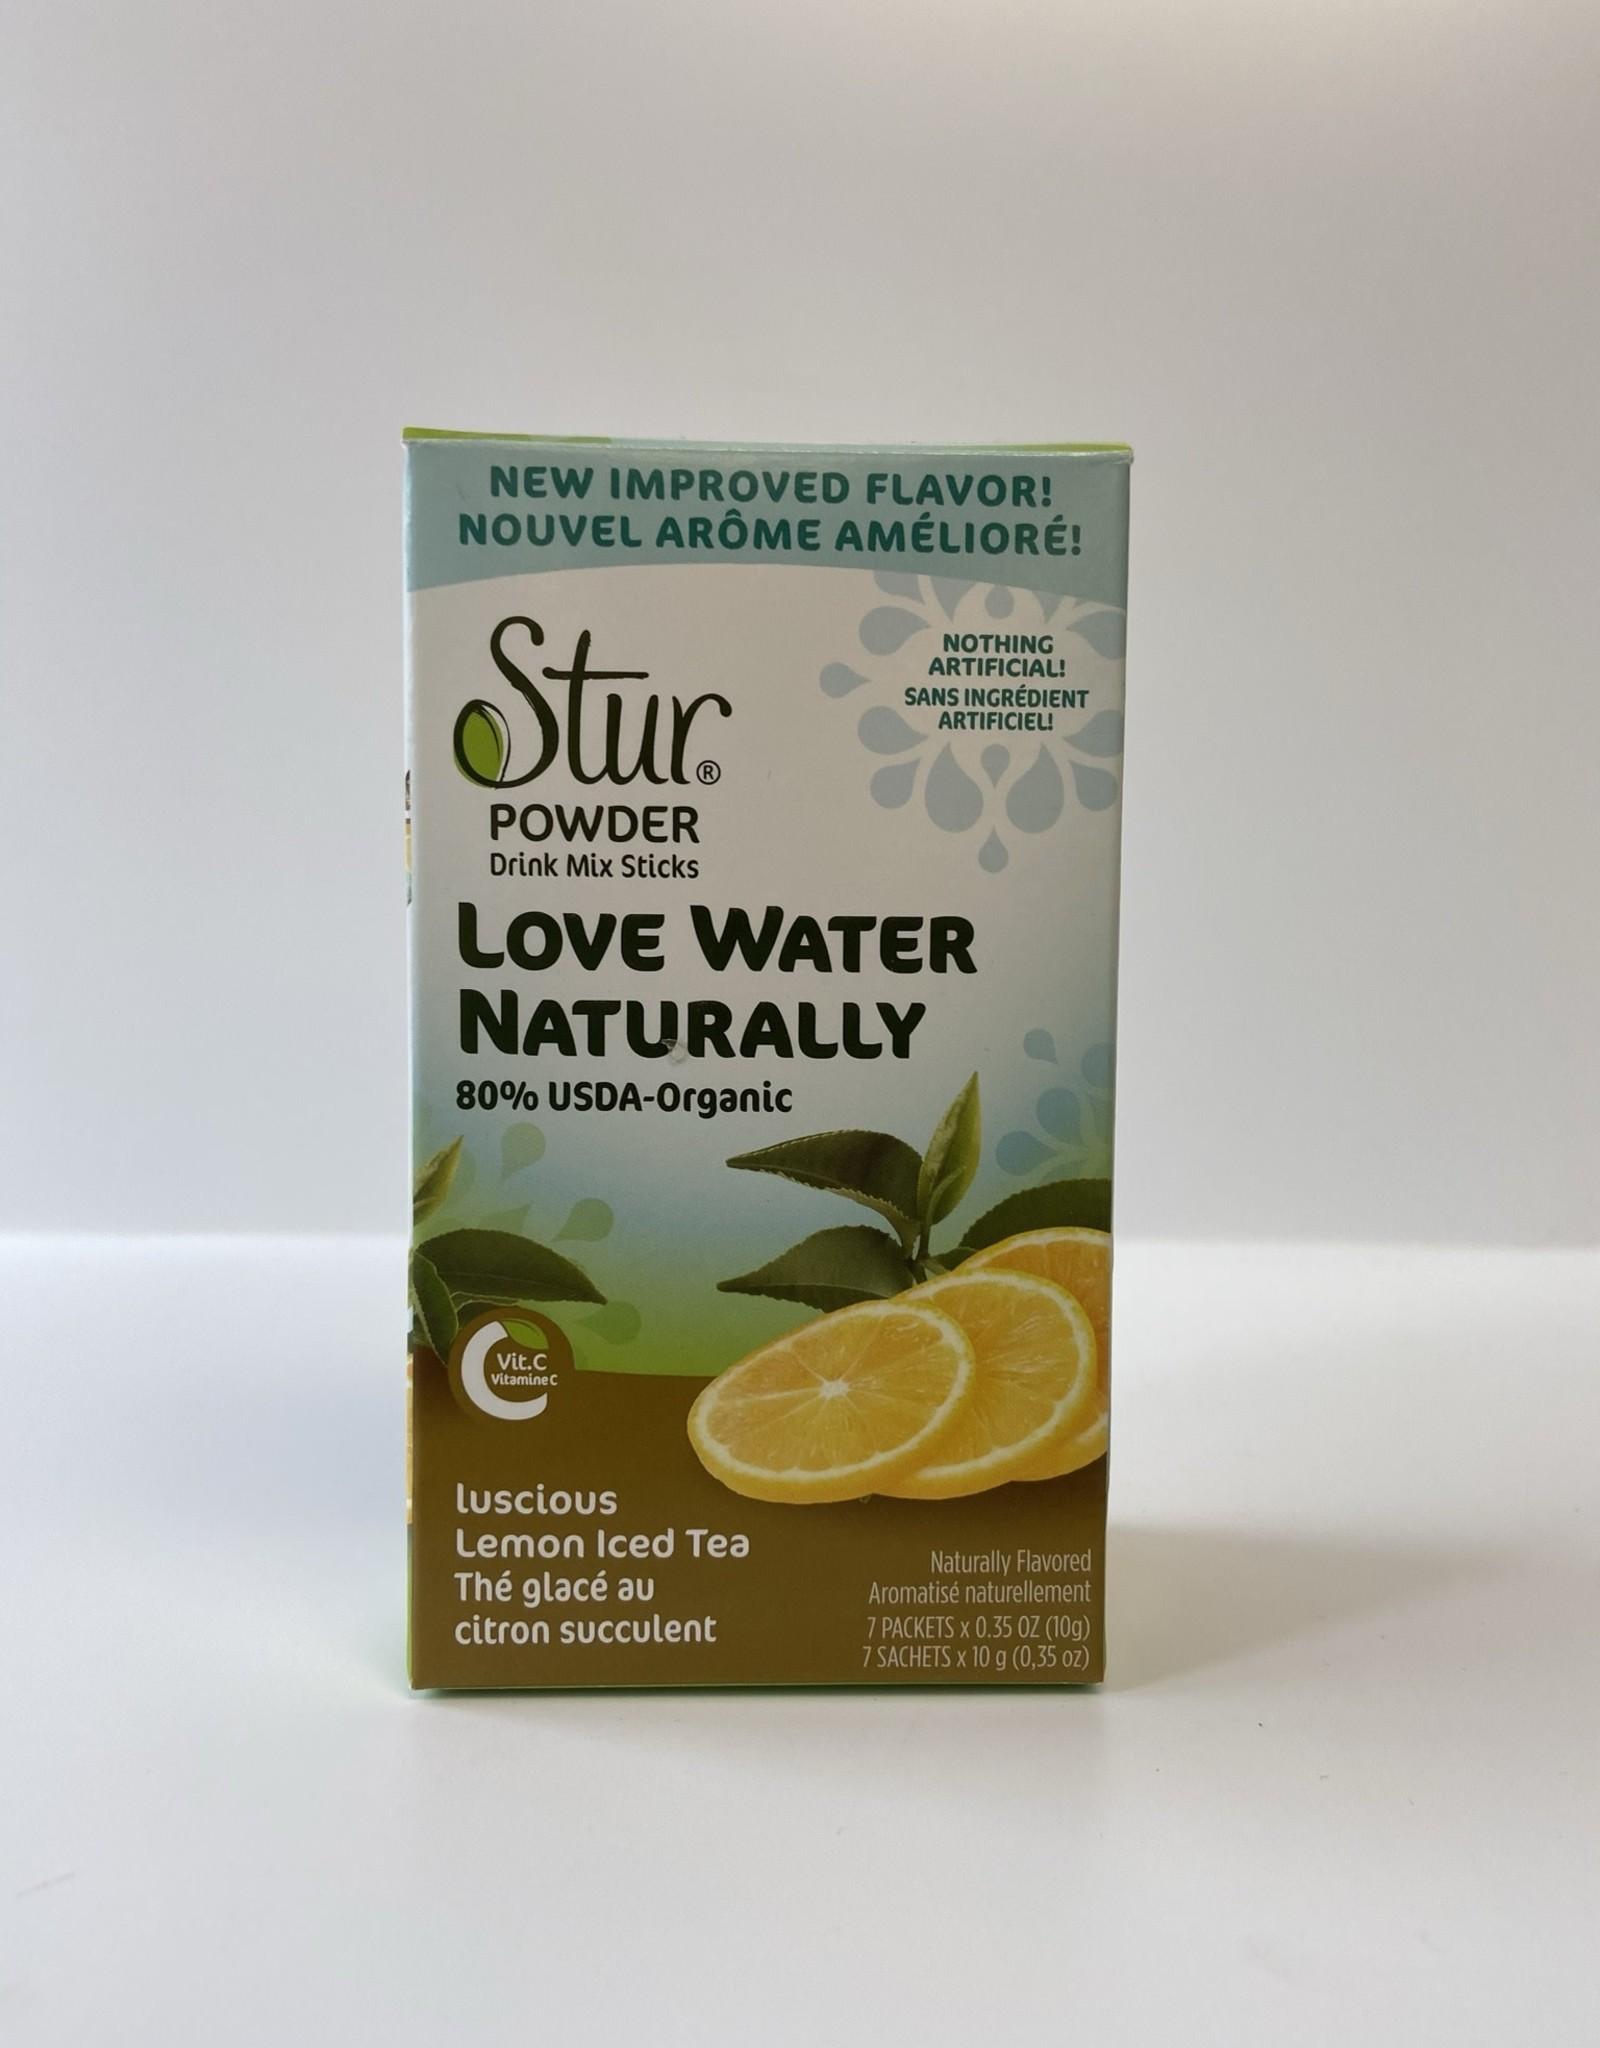 Stur Stur - Powder Drink Mix Sticks, Luscious Lemon Iced Tea